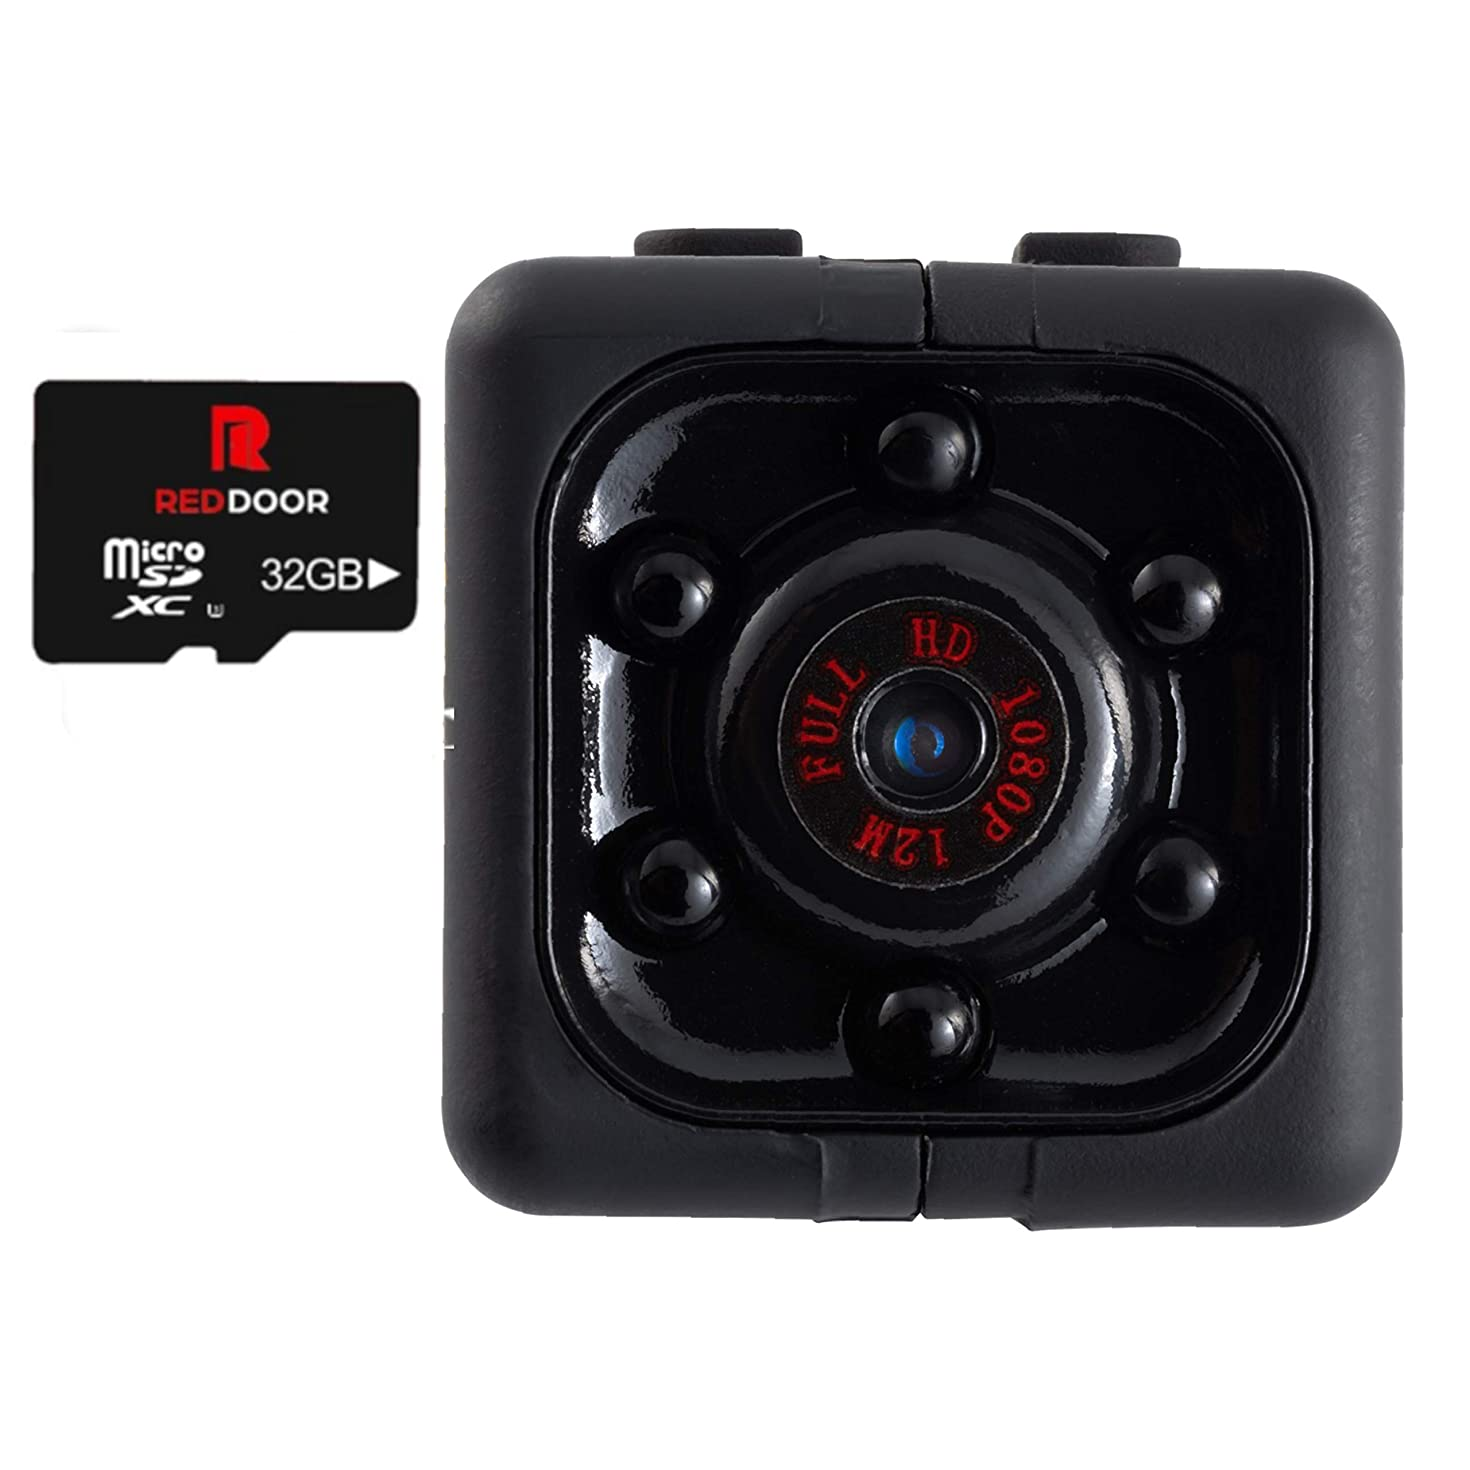 RED DOOR Mini Hidden Spy Camera Body Cam Dash Cam Nanny Cam Convert Security Camera Night Vision Motion Detection HD 1080P Smart Secret Safe Cam Drone Camera 32 GB Micro SD and Reader Included